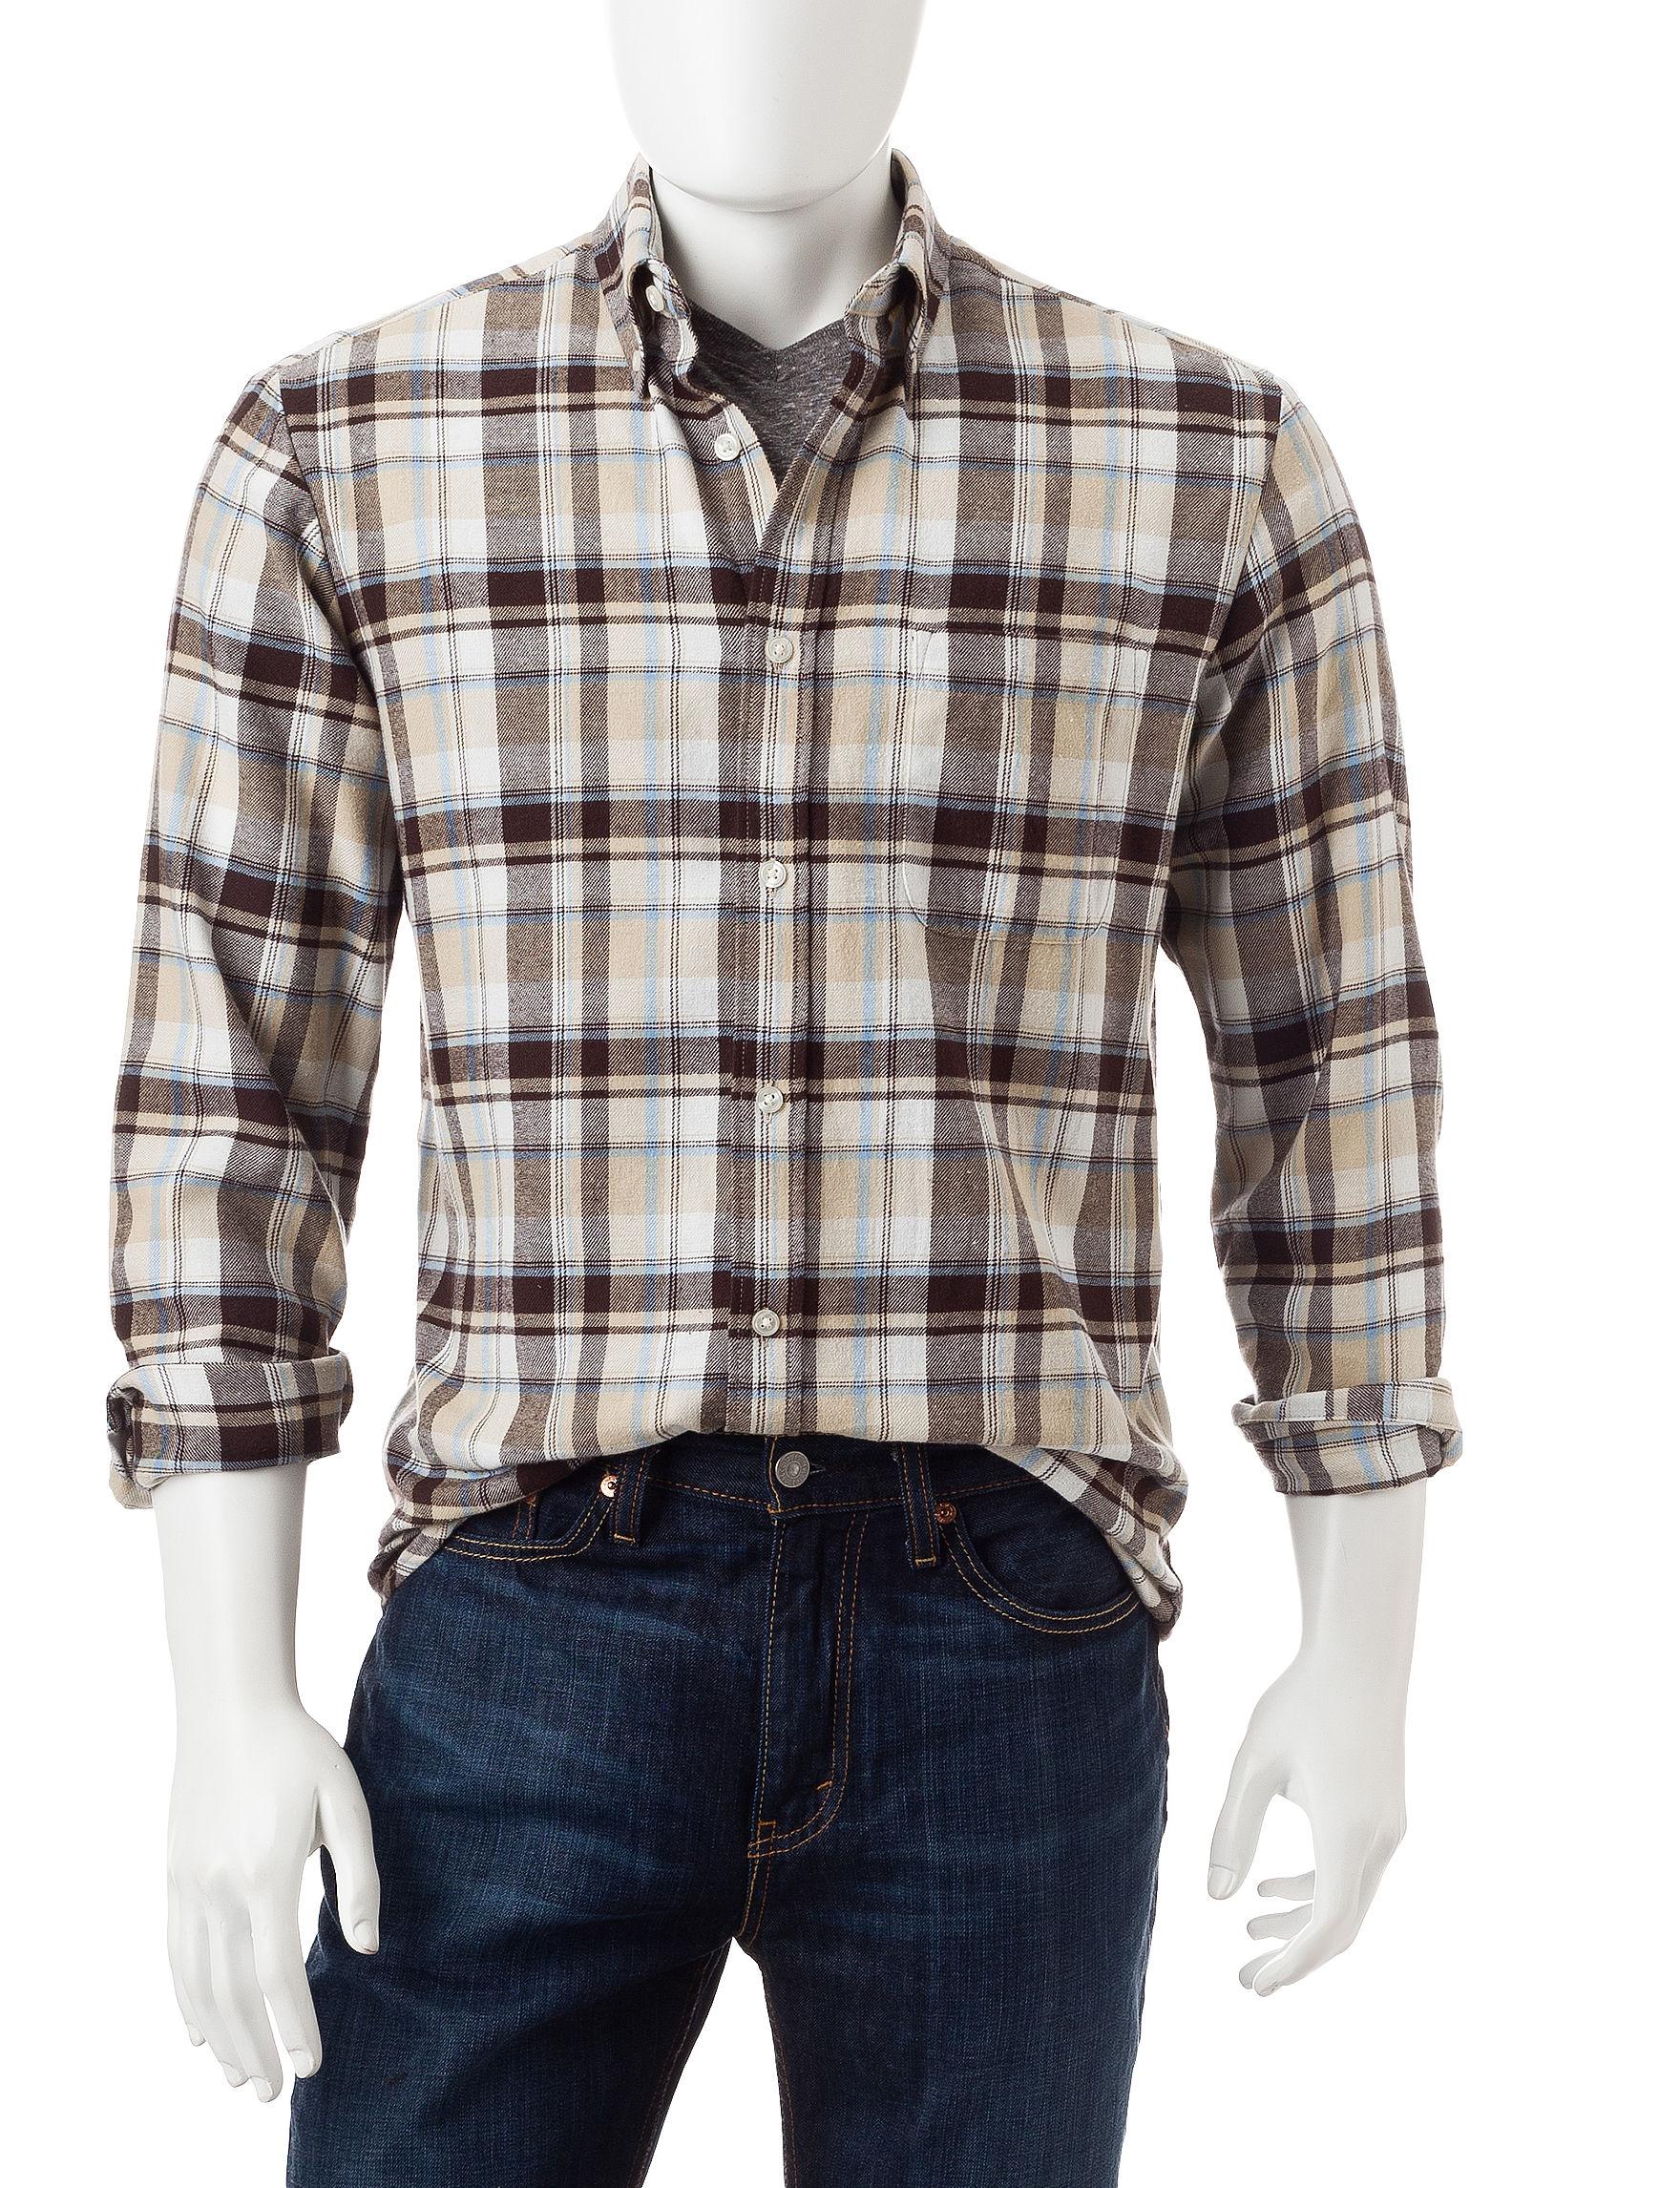 Sun River Sable Casual Button Down Shirts